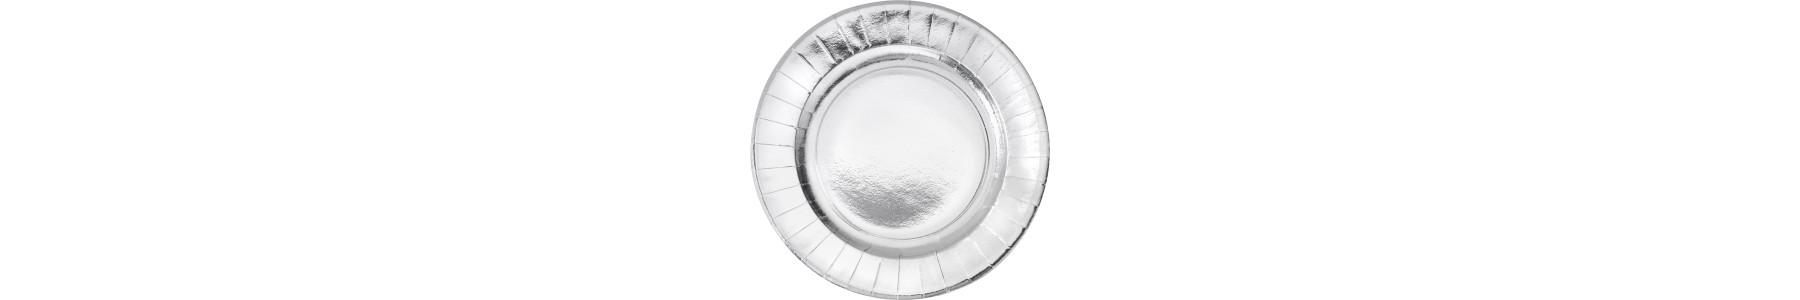 Setul Argintiu